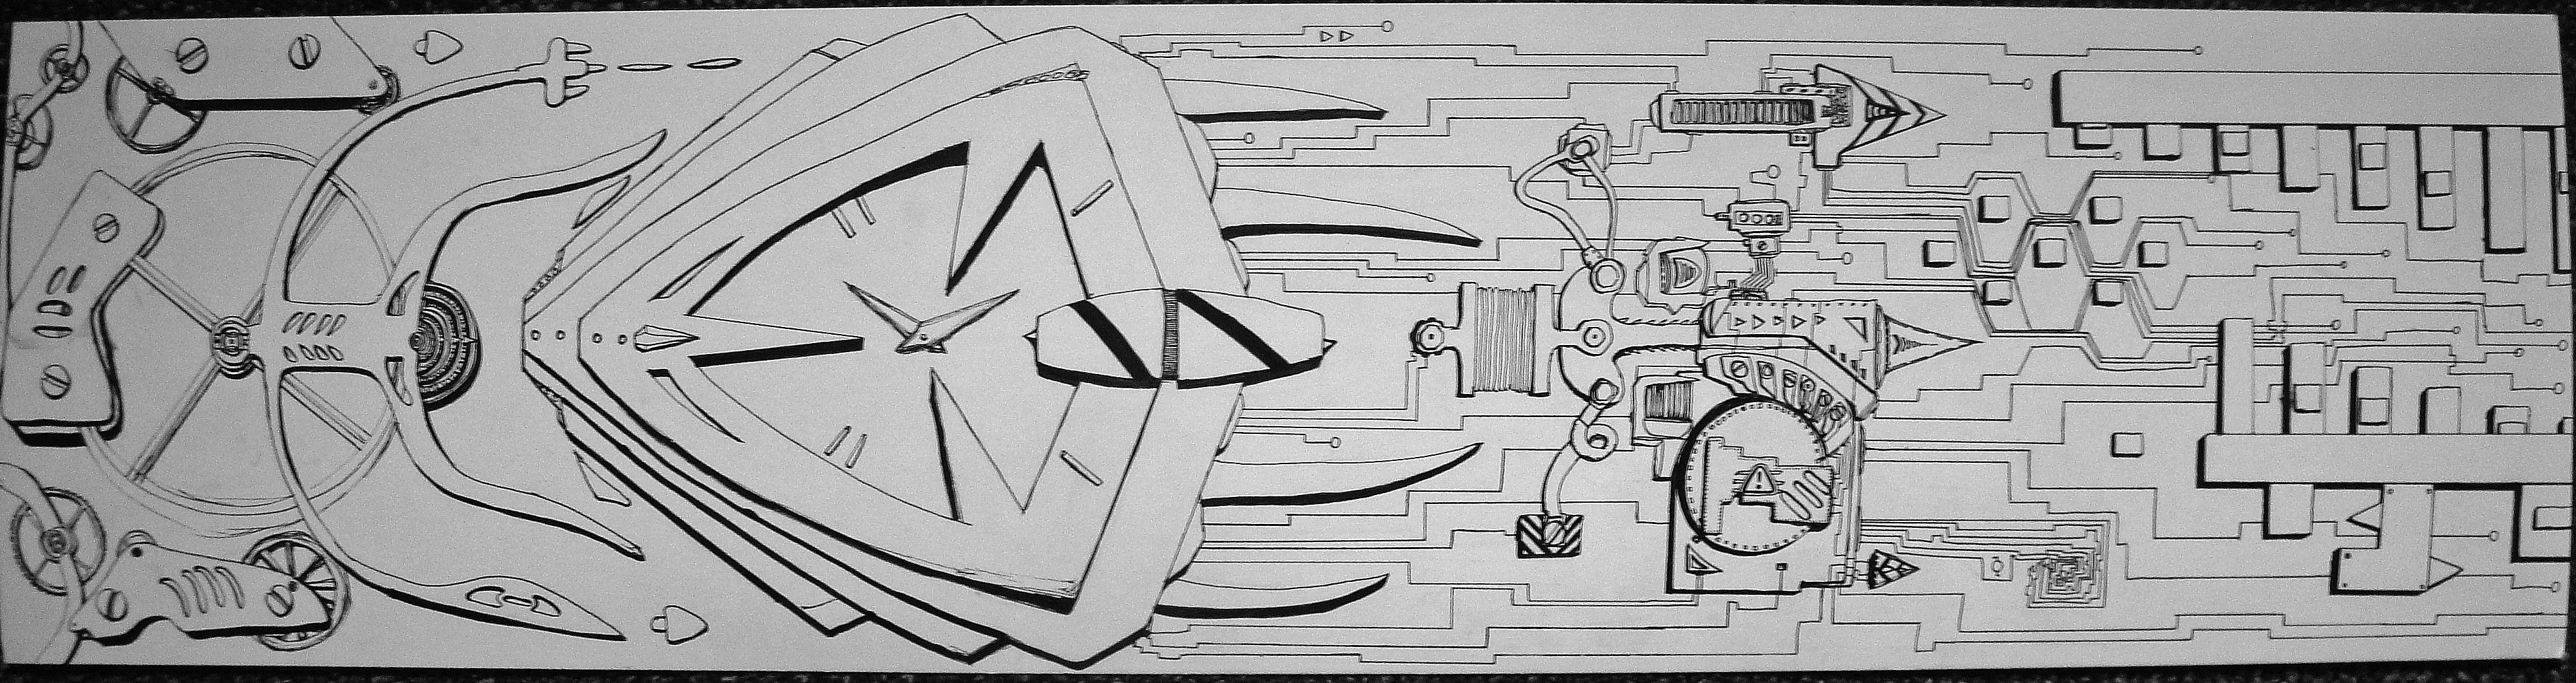 Clockwork Abstract